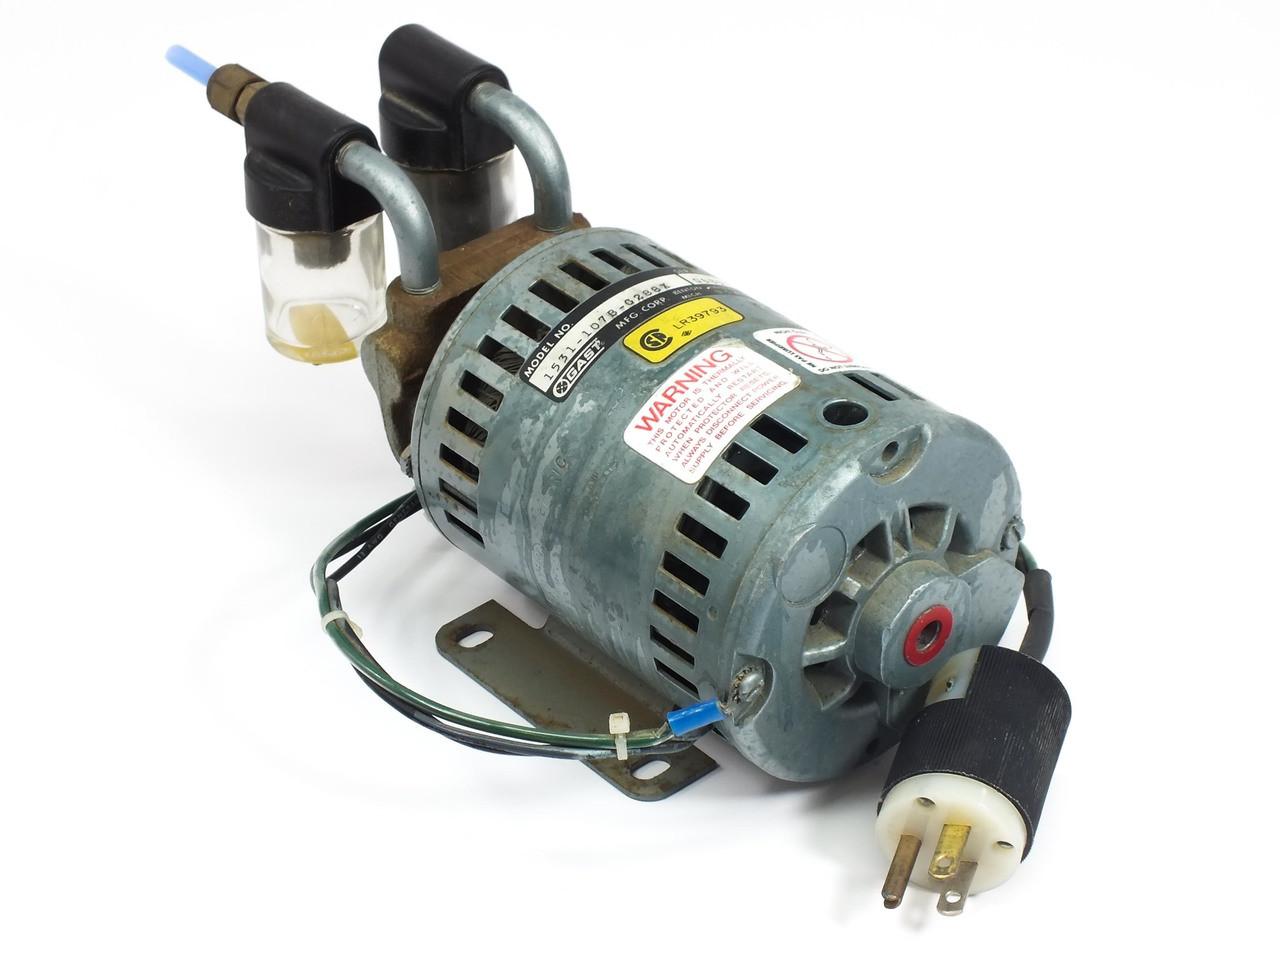 gast 110hp rotary vane vacuum pump 1531 107b g288x 1.40__37023.1490069809?c=2 gast 1531 107b g288x 1 10 hp rotary vane vacuum pump gast vacuum pump wiring diagrams at soozxer.org